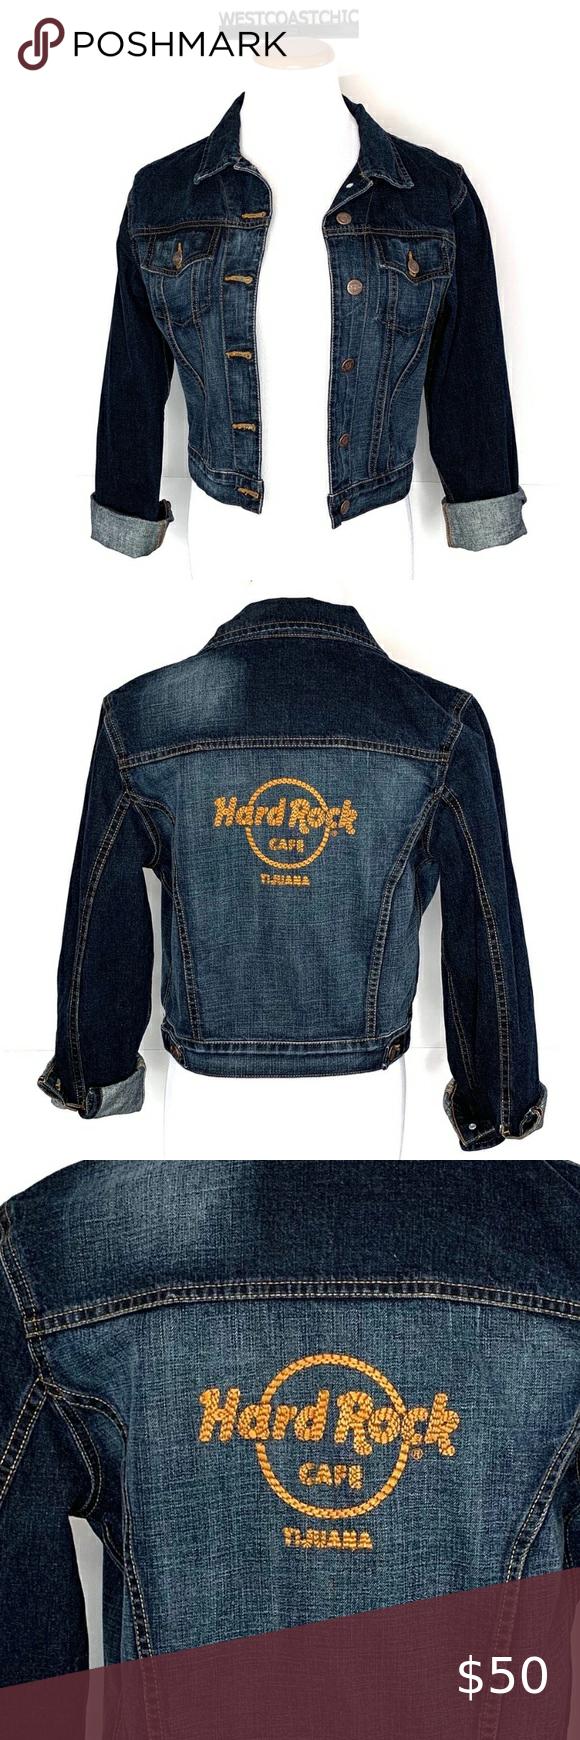 Hard Rock Cafe Tijuana Denim Jacket Size Small This Is A Hard Rock Cafe Tijuana Jean Jacket In Excellent Pre Owned Conditio Cafe Jacket Denim Jacket Jean Coat [ 1740 x 580 Pixel ]